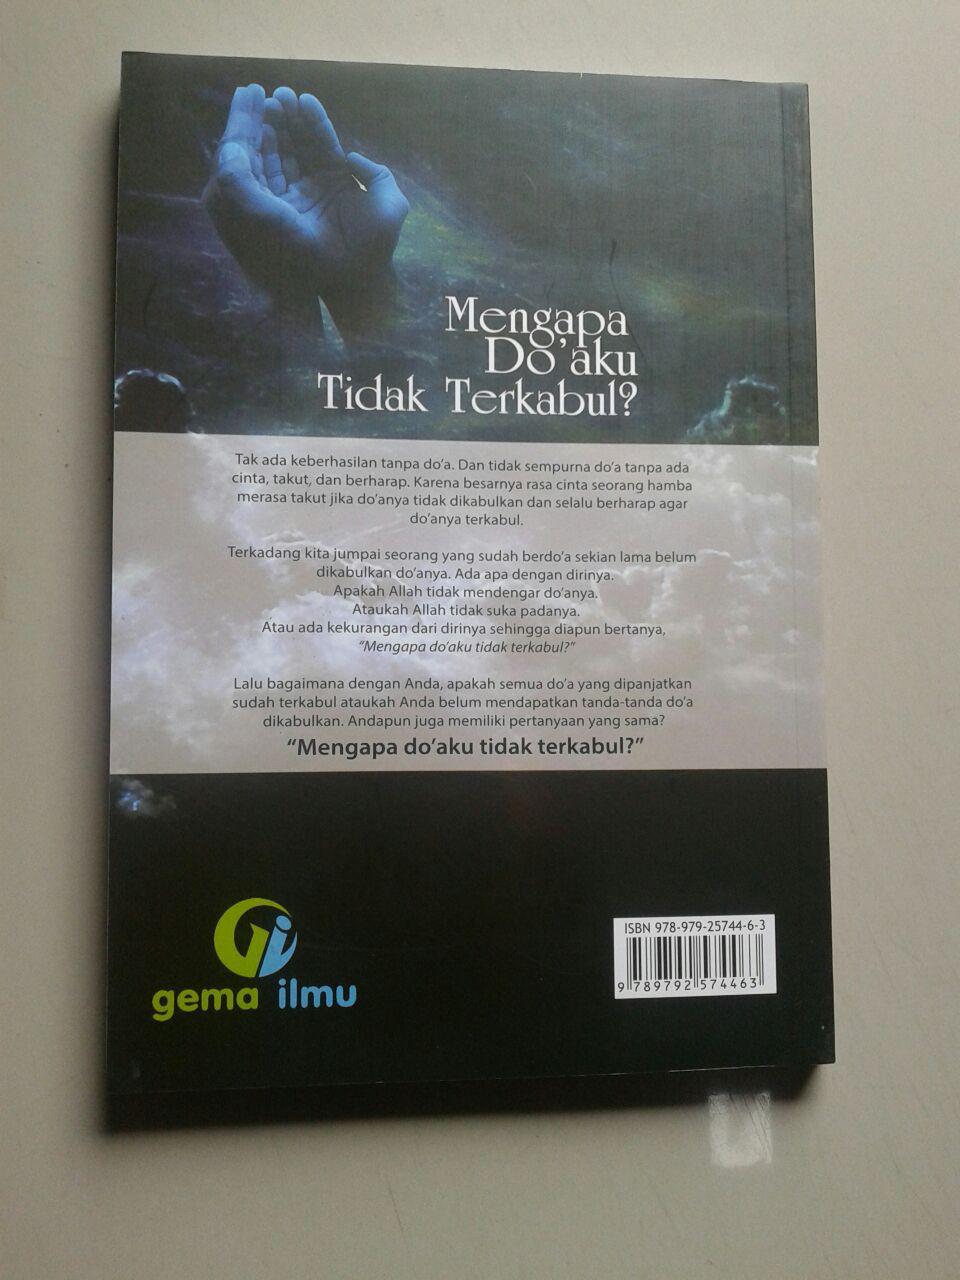 Buku Mengapa Do'aku Tidak Terkabul? cover